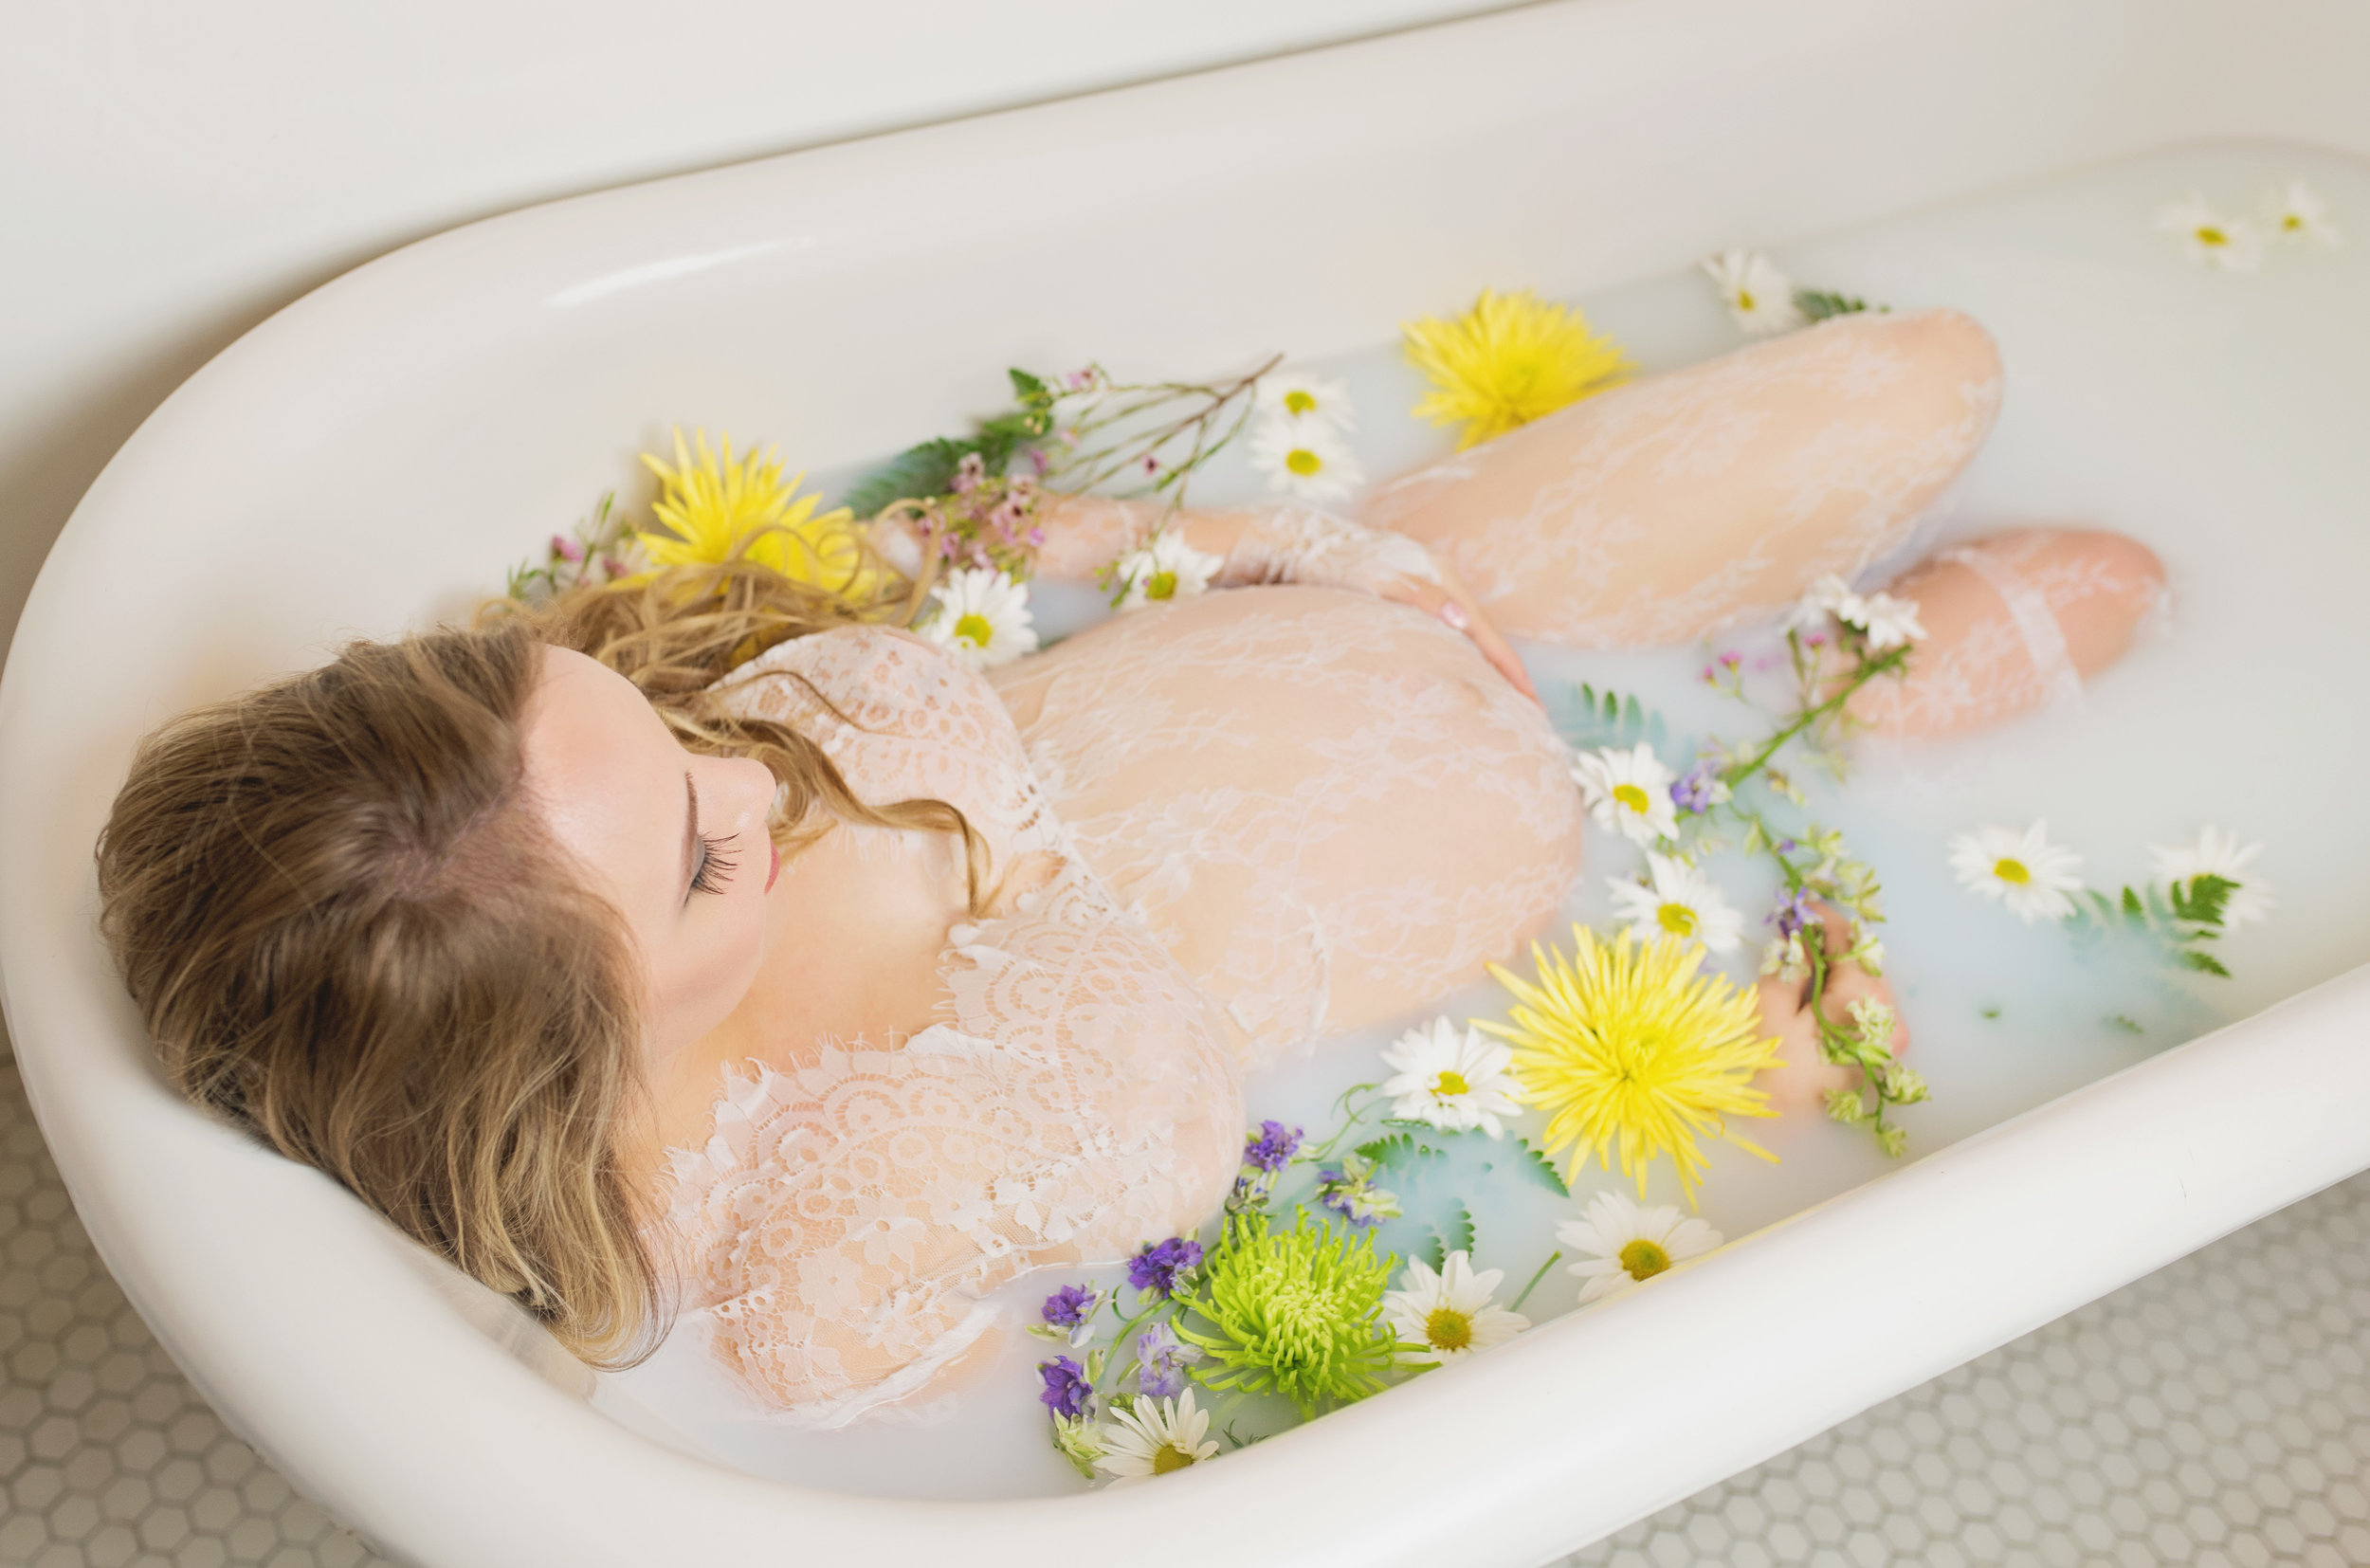 milk bath maternity photo session